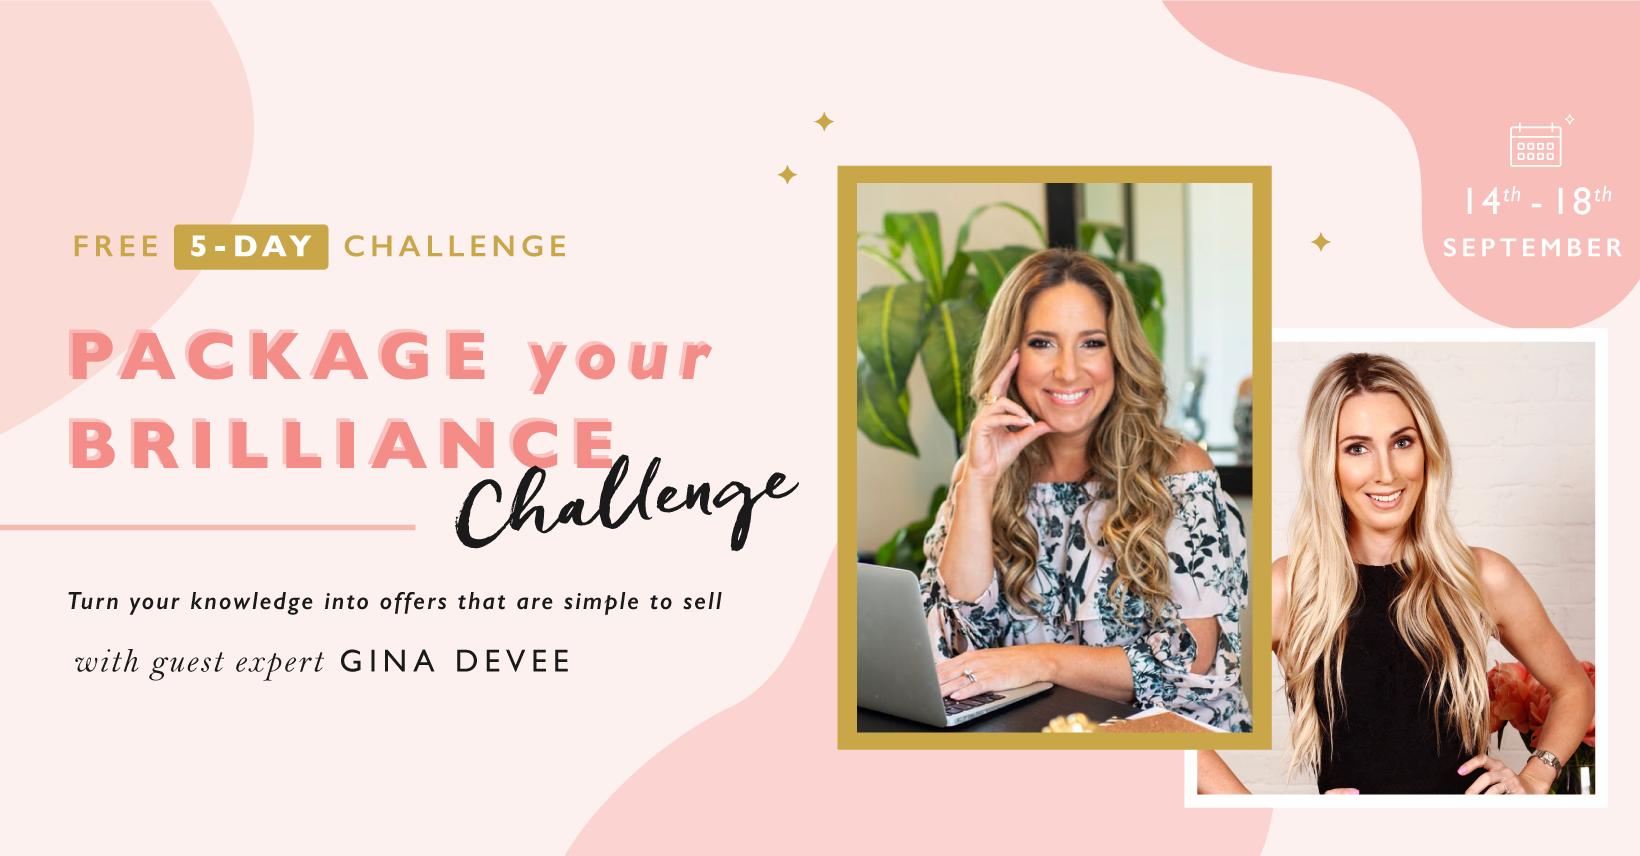 Free 5 day challenge